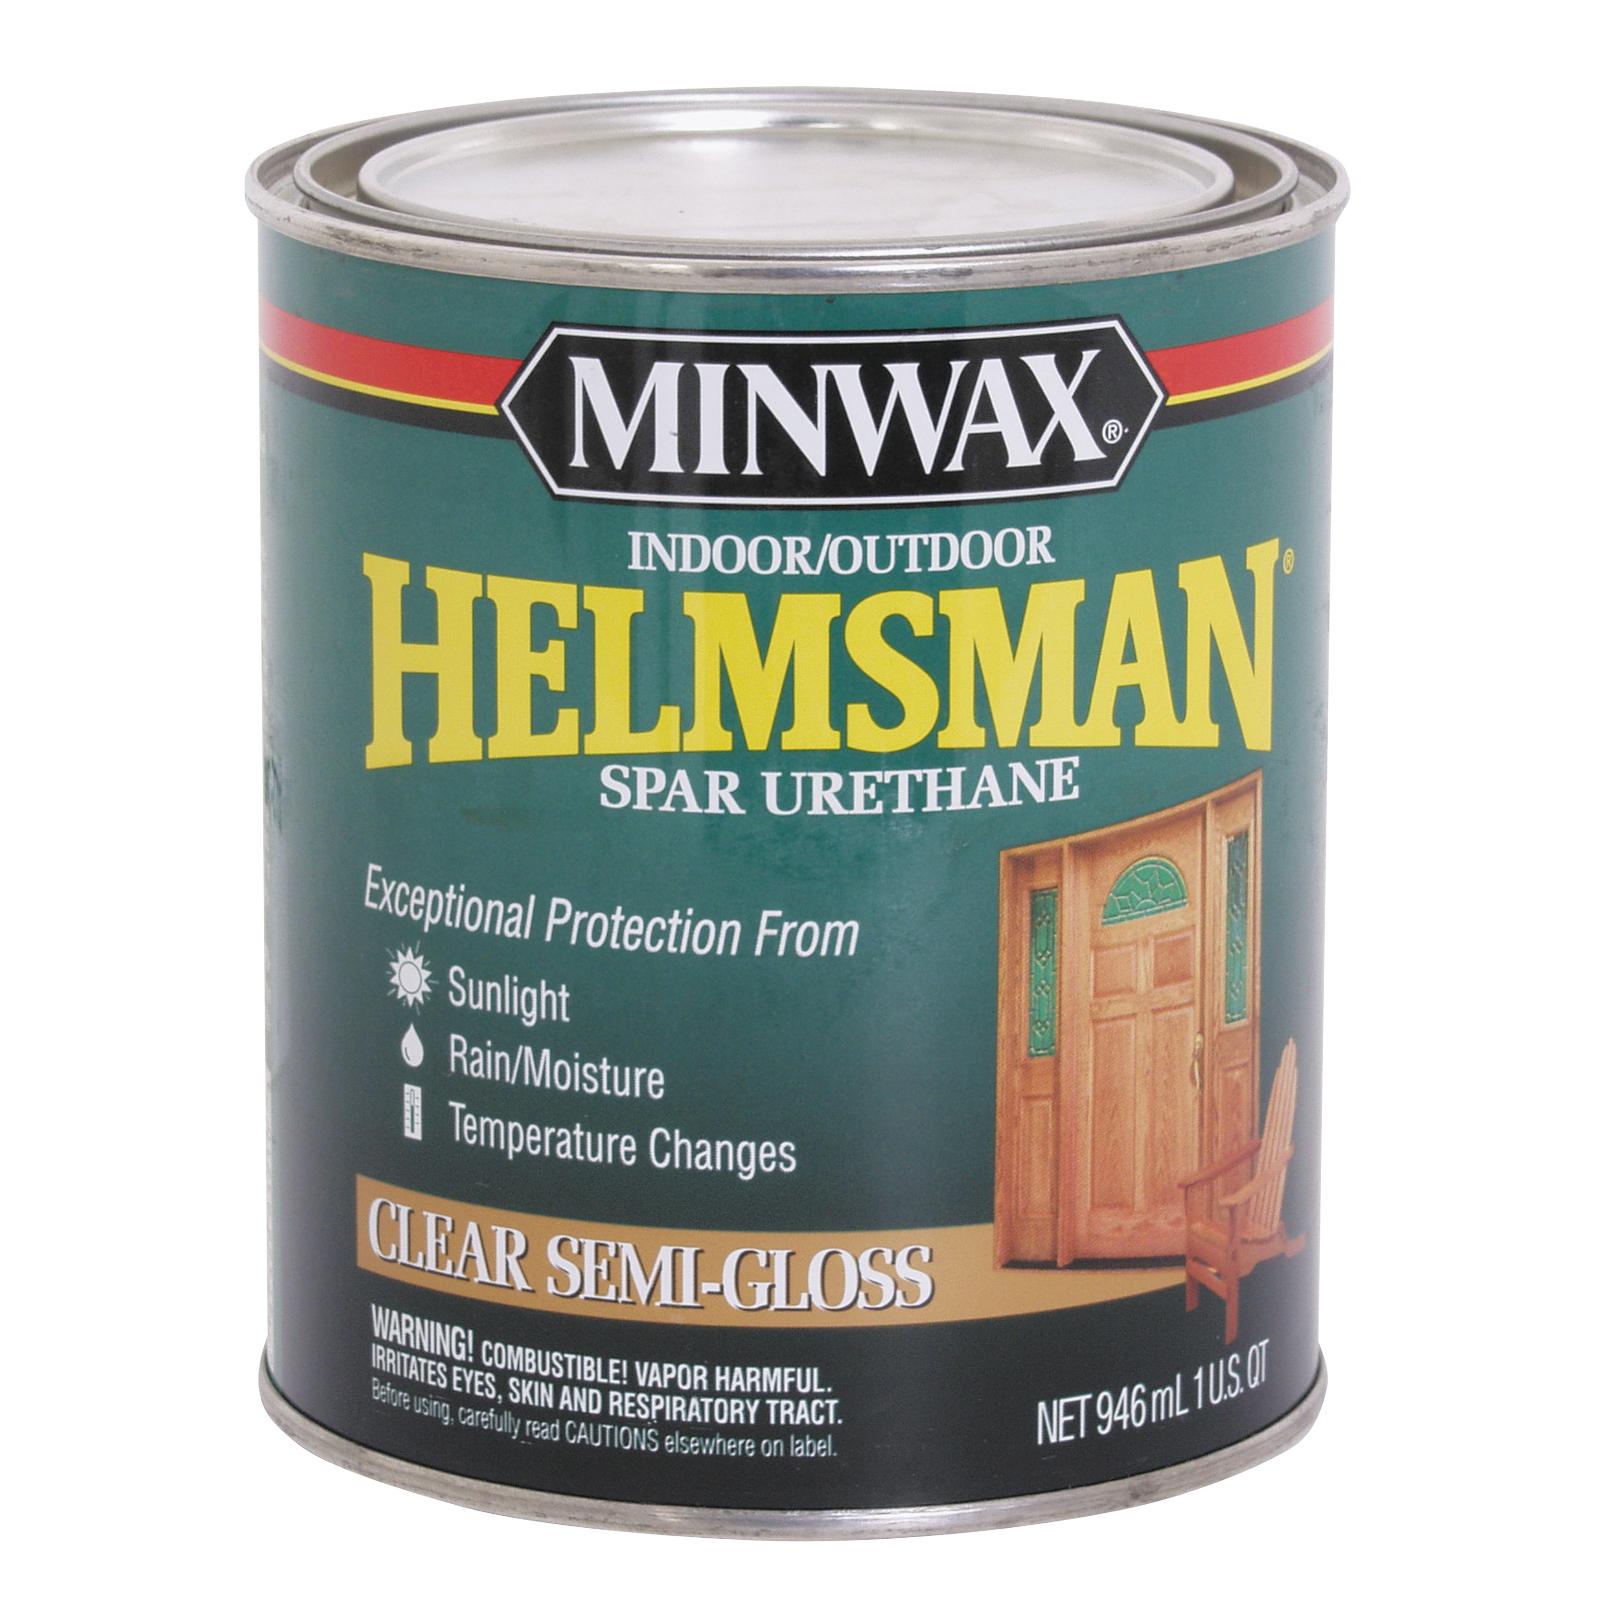 Picture of Minwax Helmsman 63210444 Spar Urethane Paint, Semi-Gloss, Clear, Liquid, 1 qt, Can